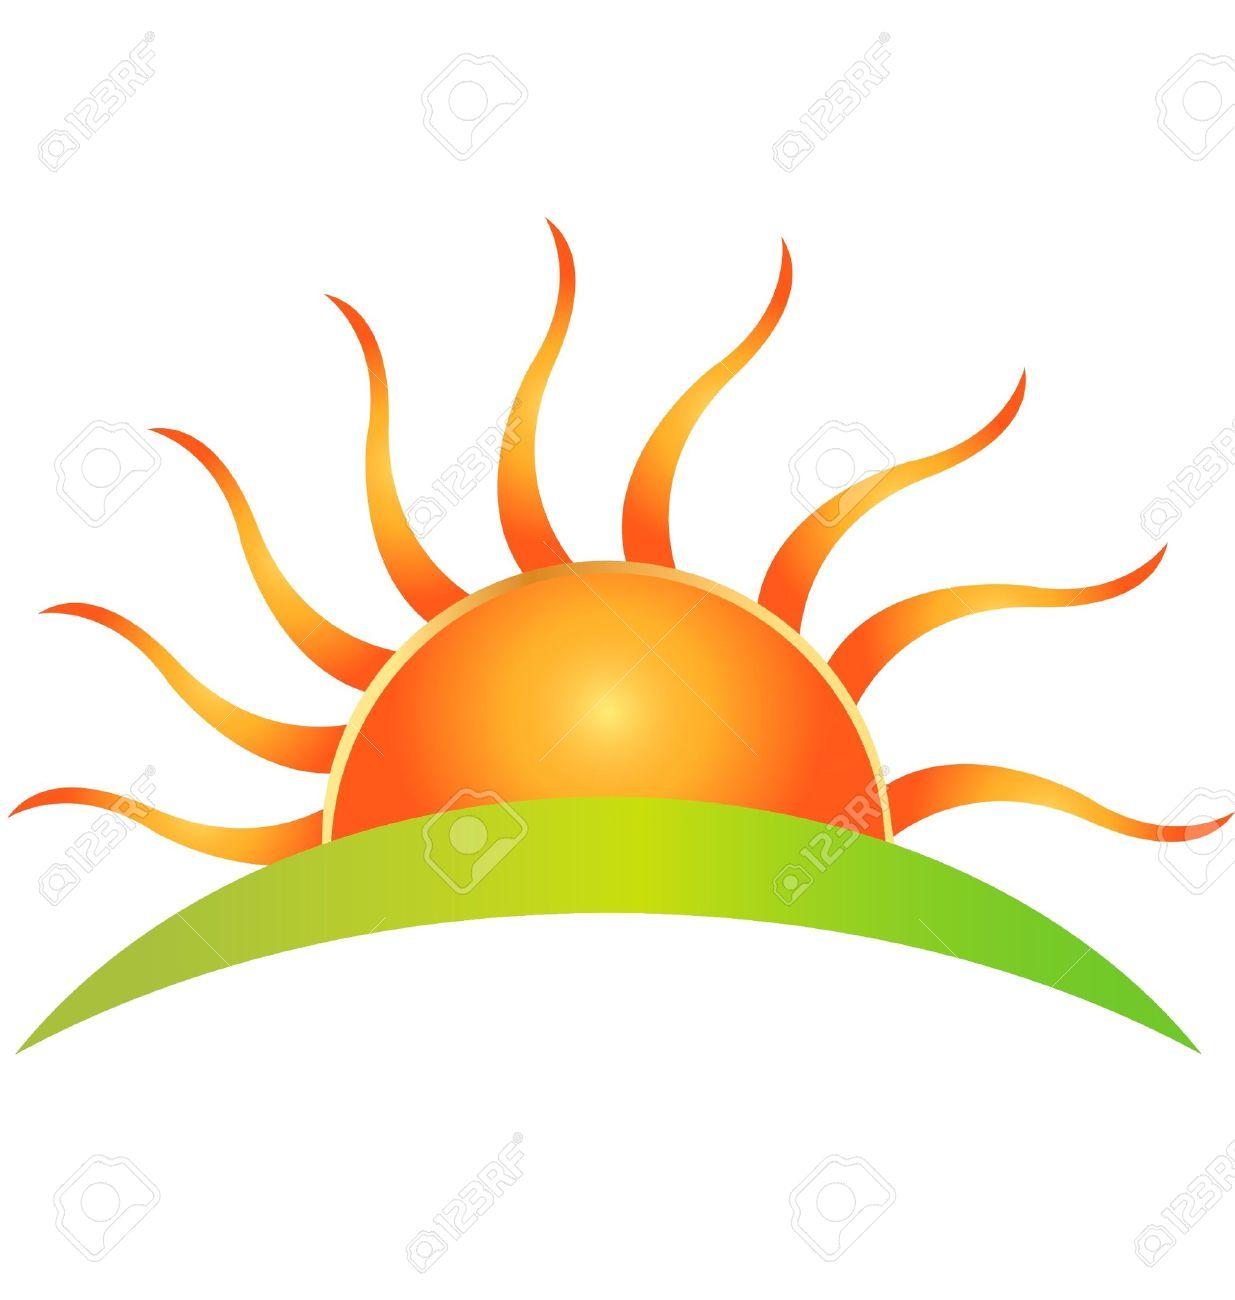 sun logo royalty free cliparts vectors and stock illustration rh 123rf com sun logistics nyc sun logistics tracking